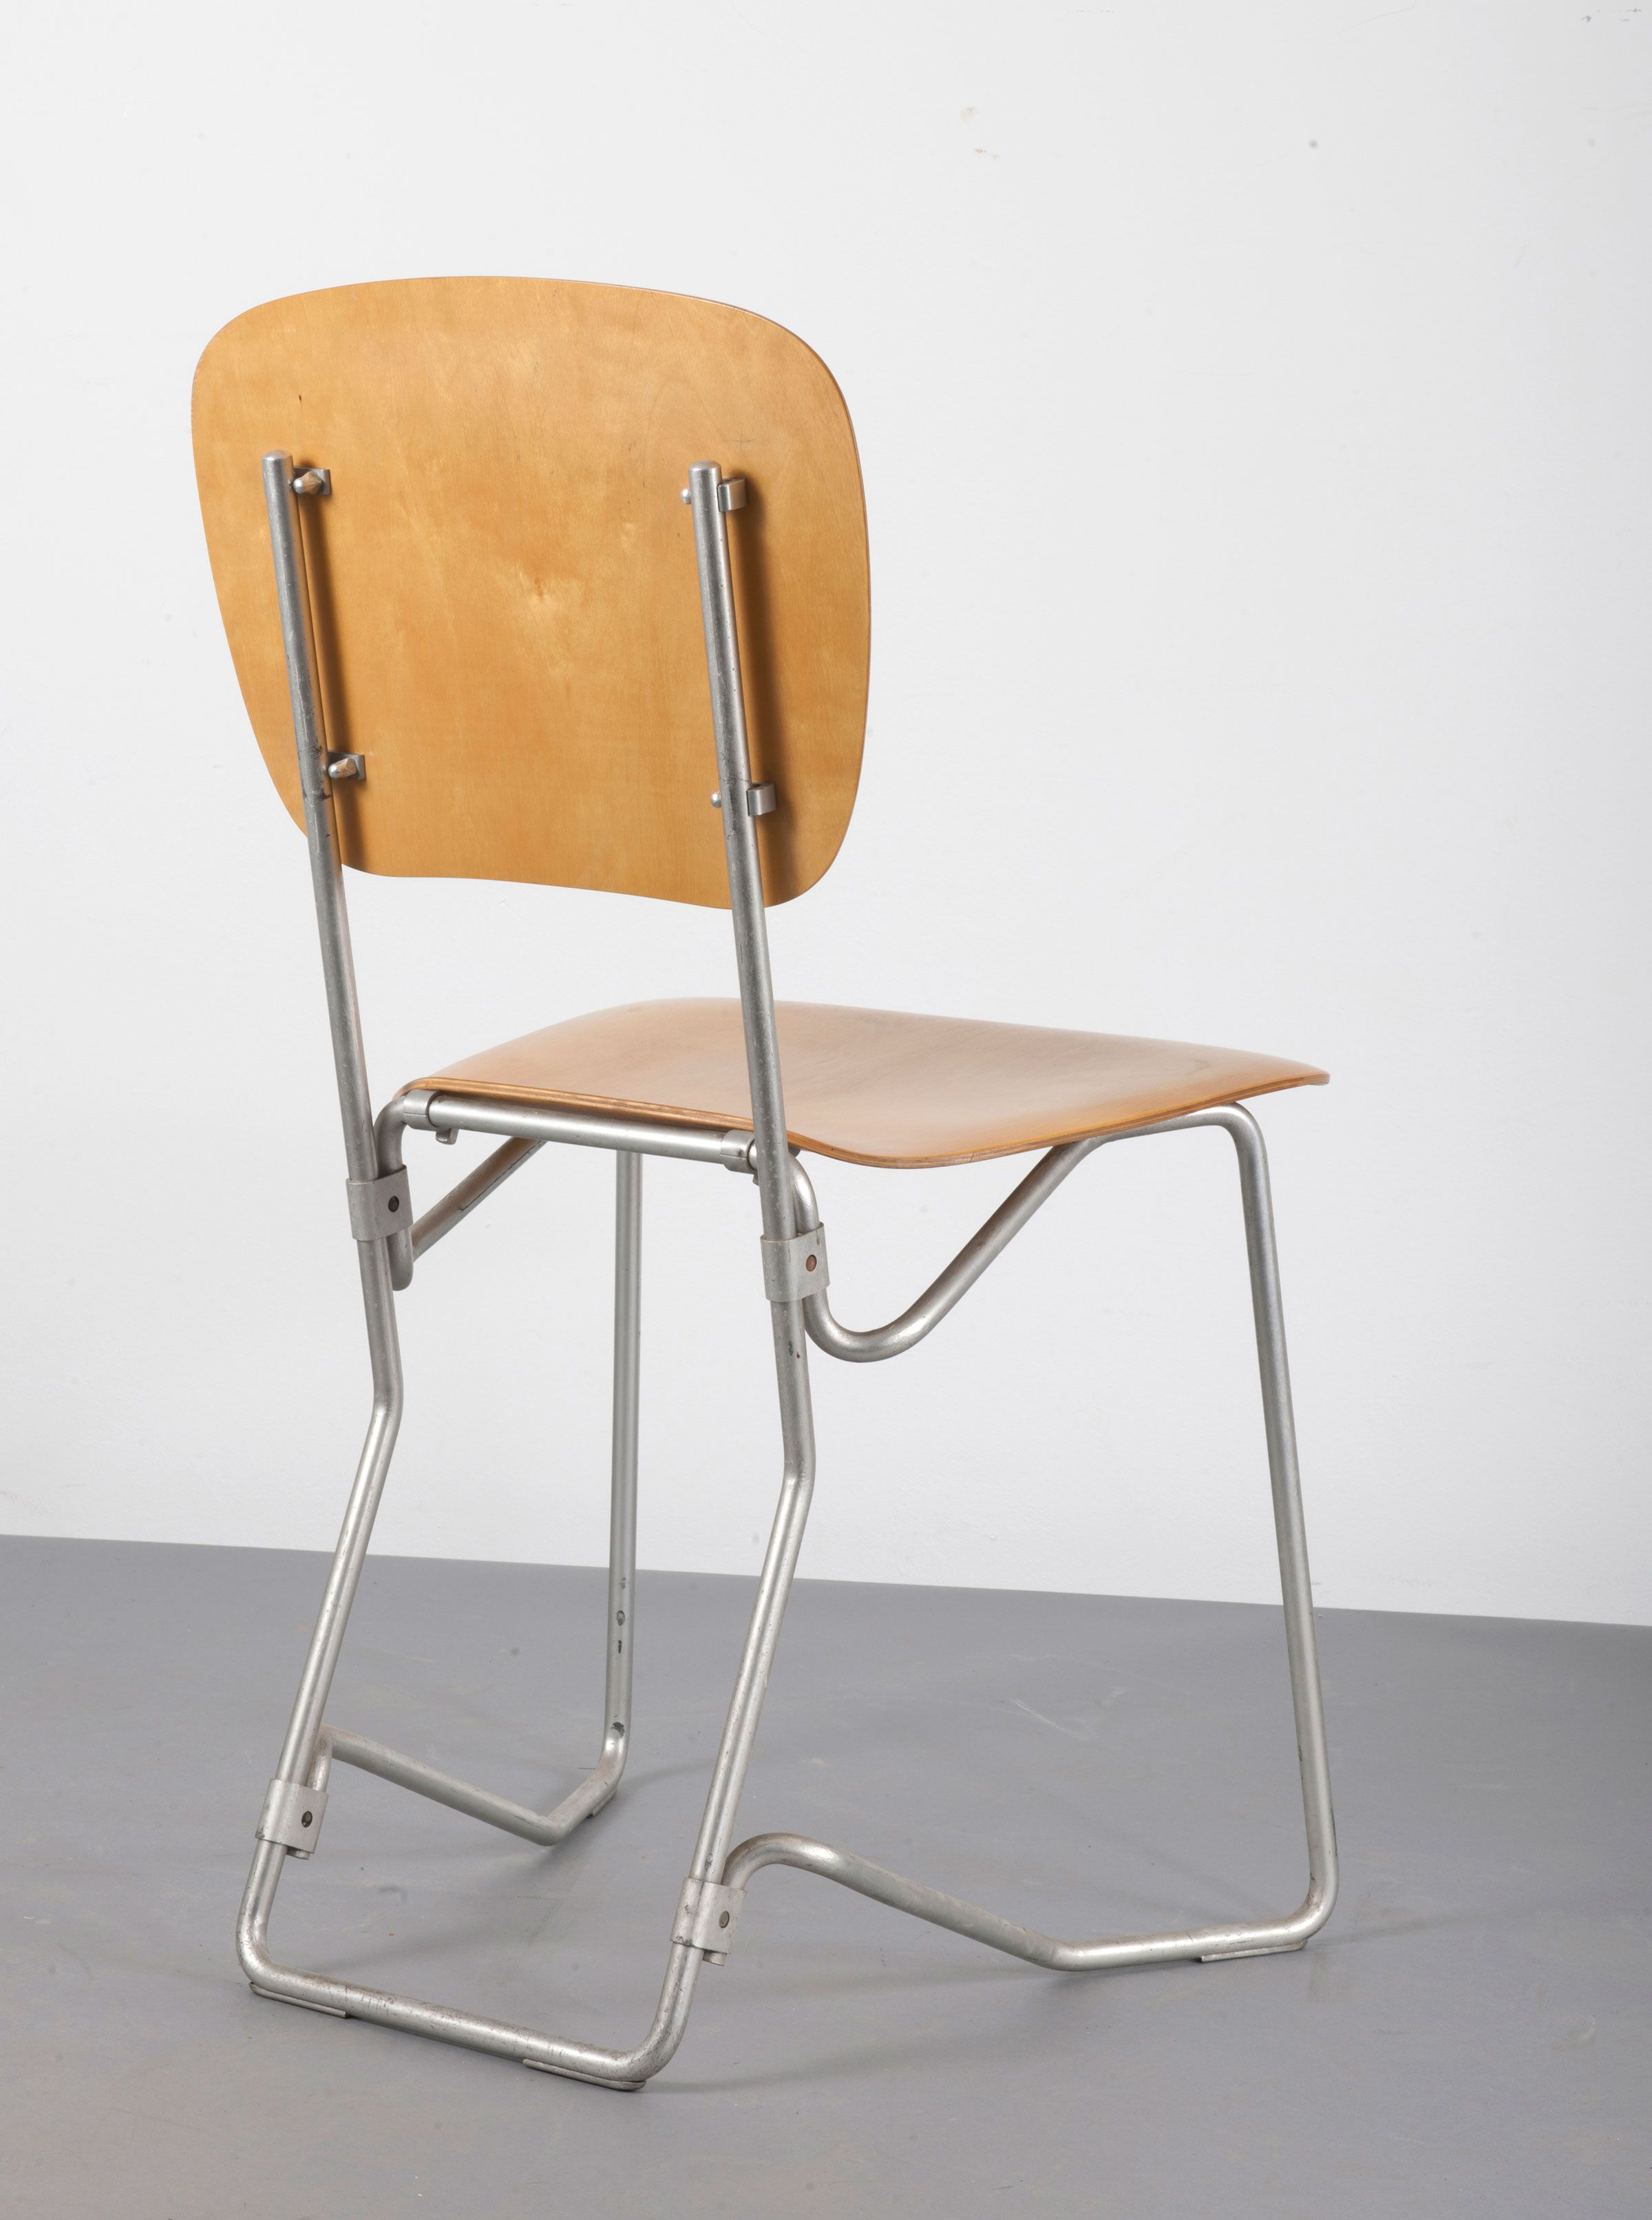 Nice Armin Wirth; Tubular Aluminum And Plywood U0027Aruflexu0027 Folding Chair For  Philip Zieringer Metallwerke Amazing Design